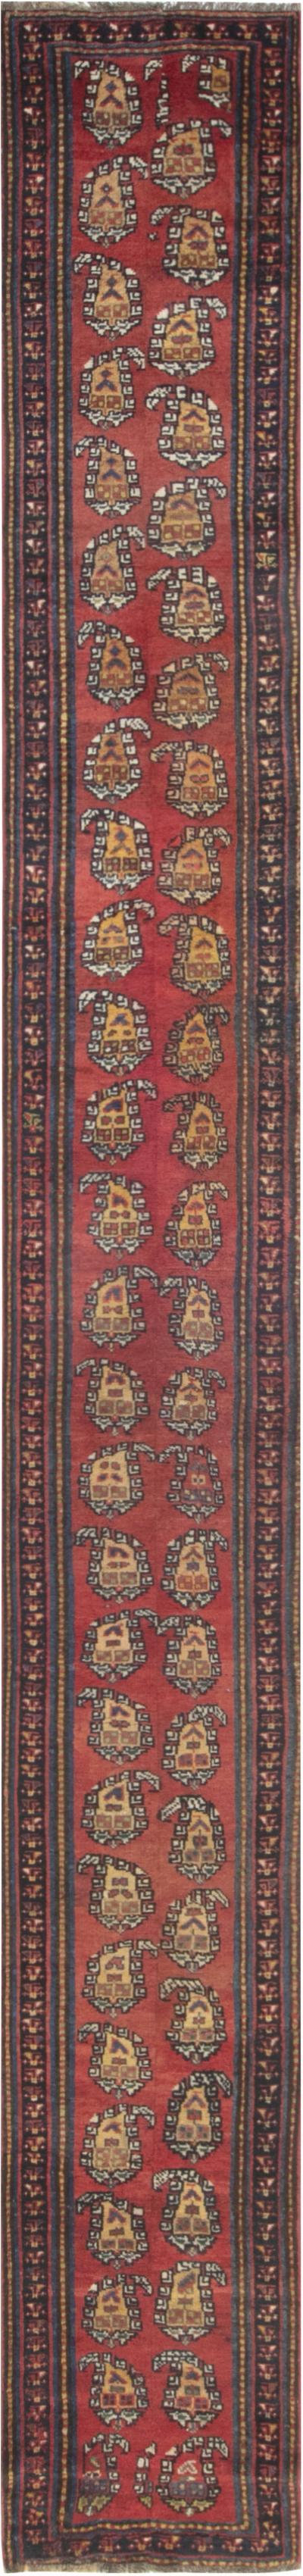 Antique Persian Bakhtiari runner Fragment